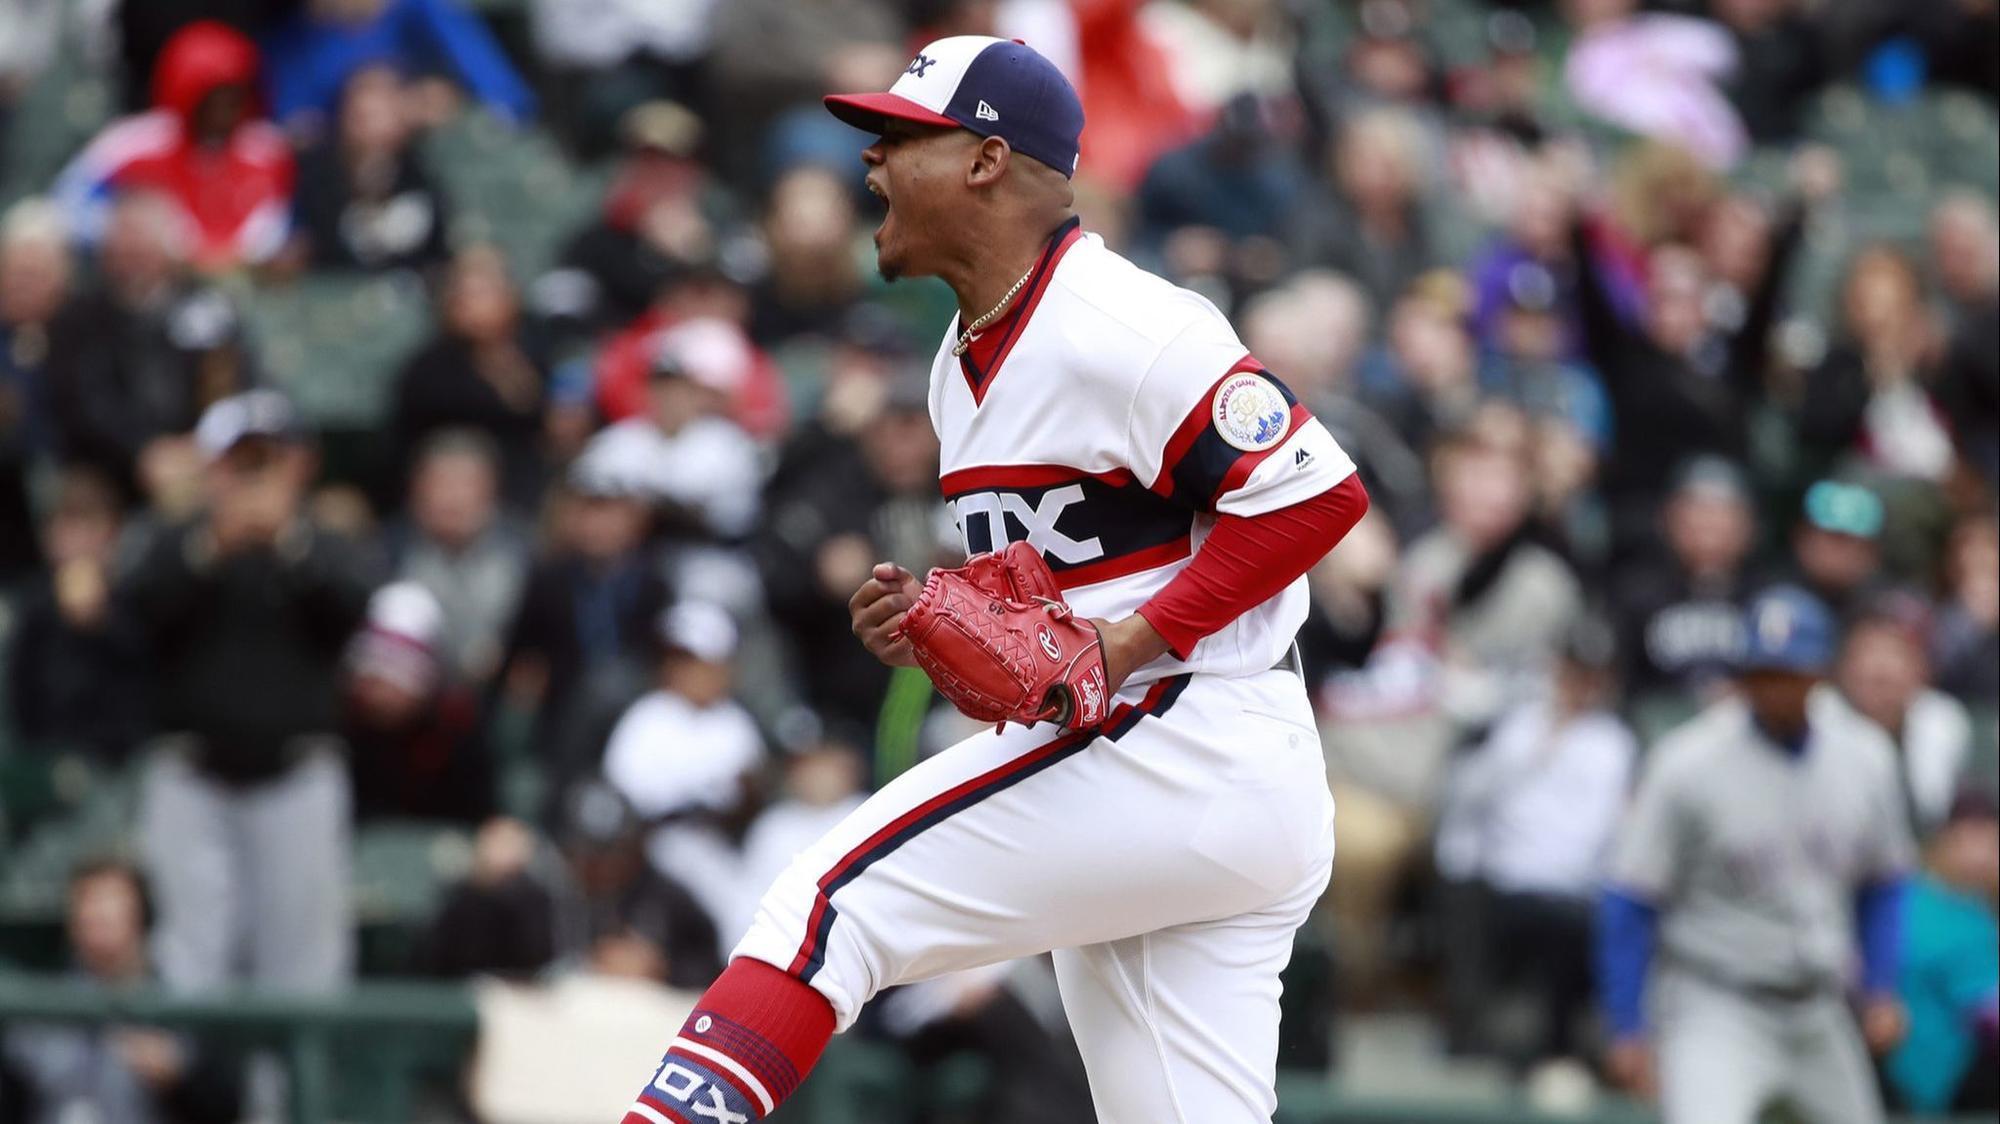 Baseball s weirdest uniforms get shredded in  Winning Ugly  - Chicago  Tribune 618ae79af